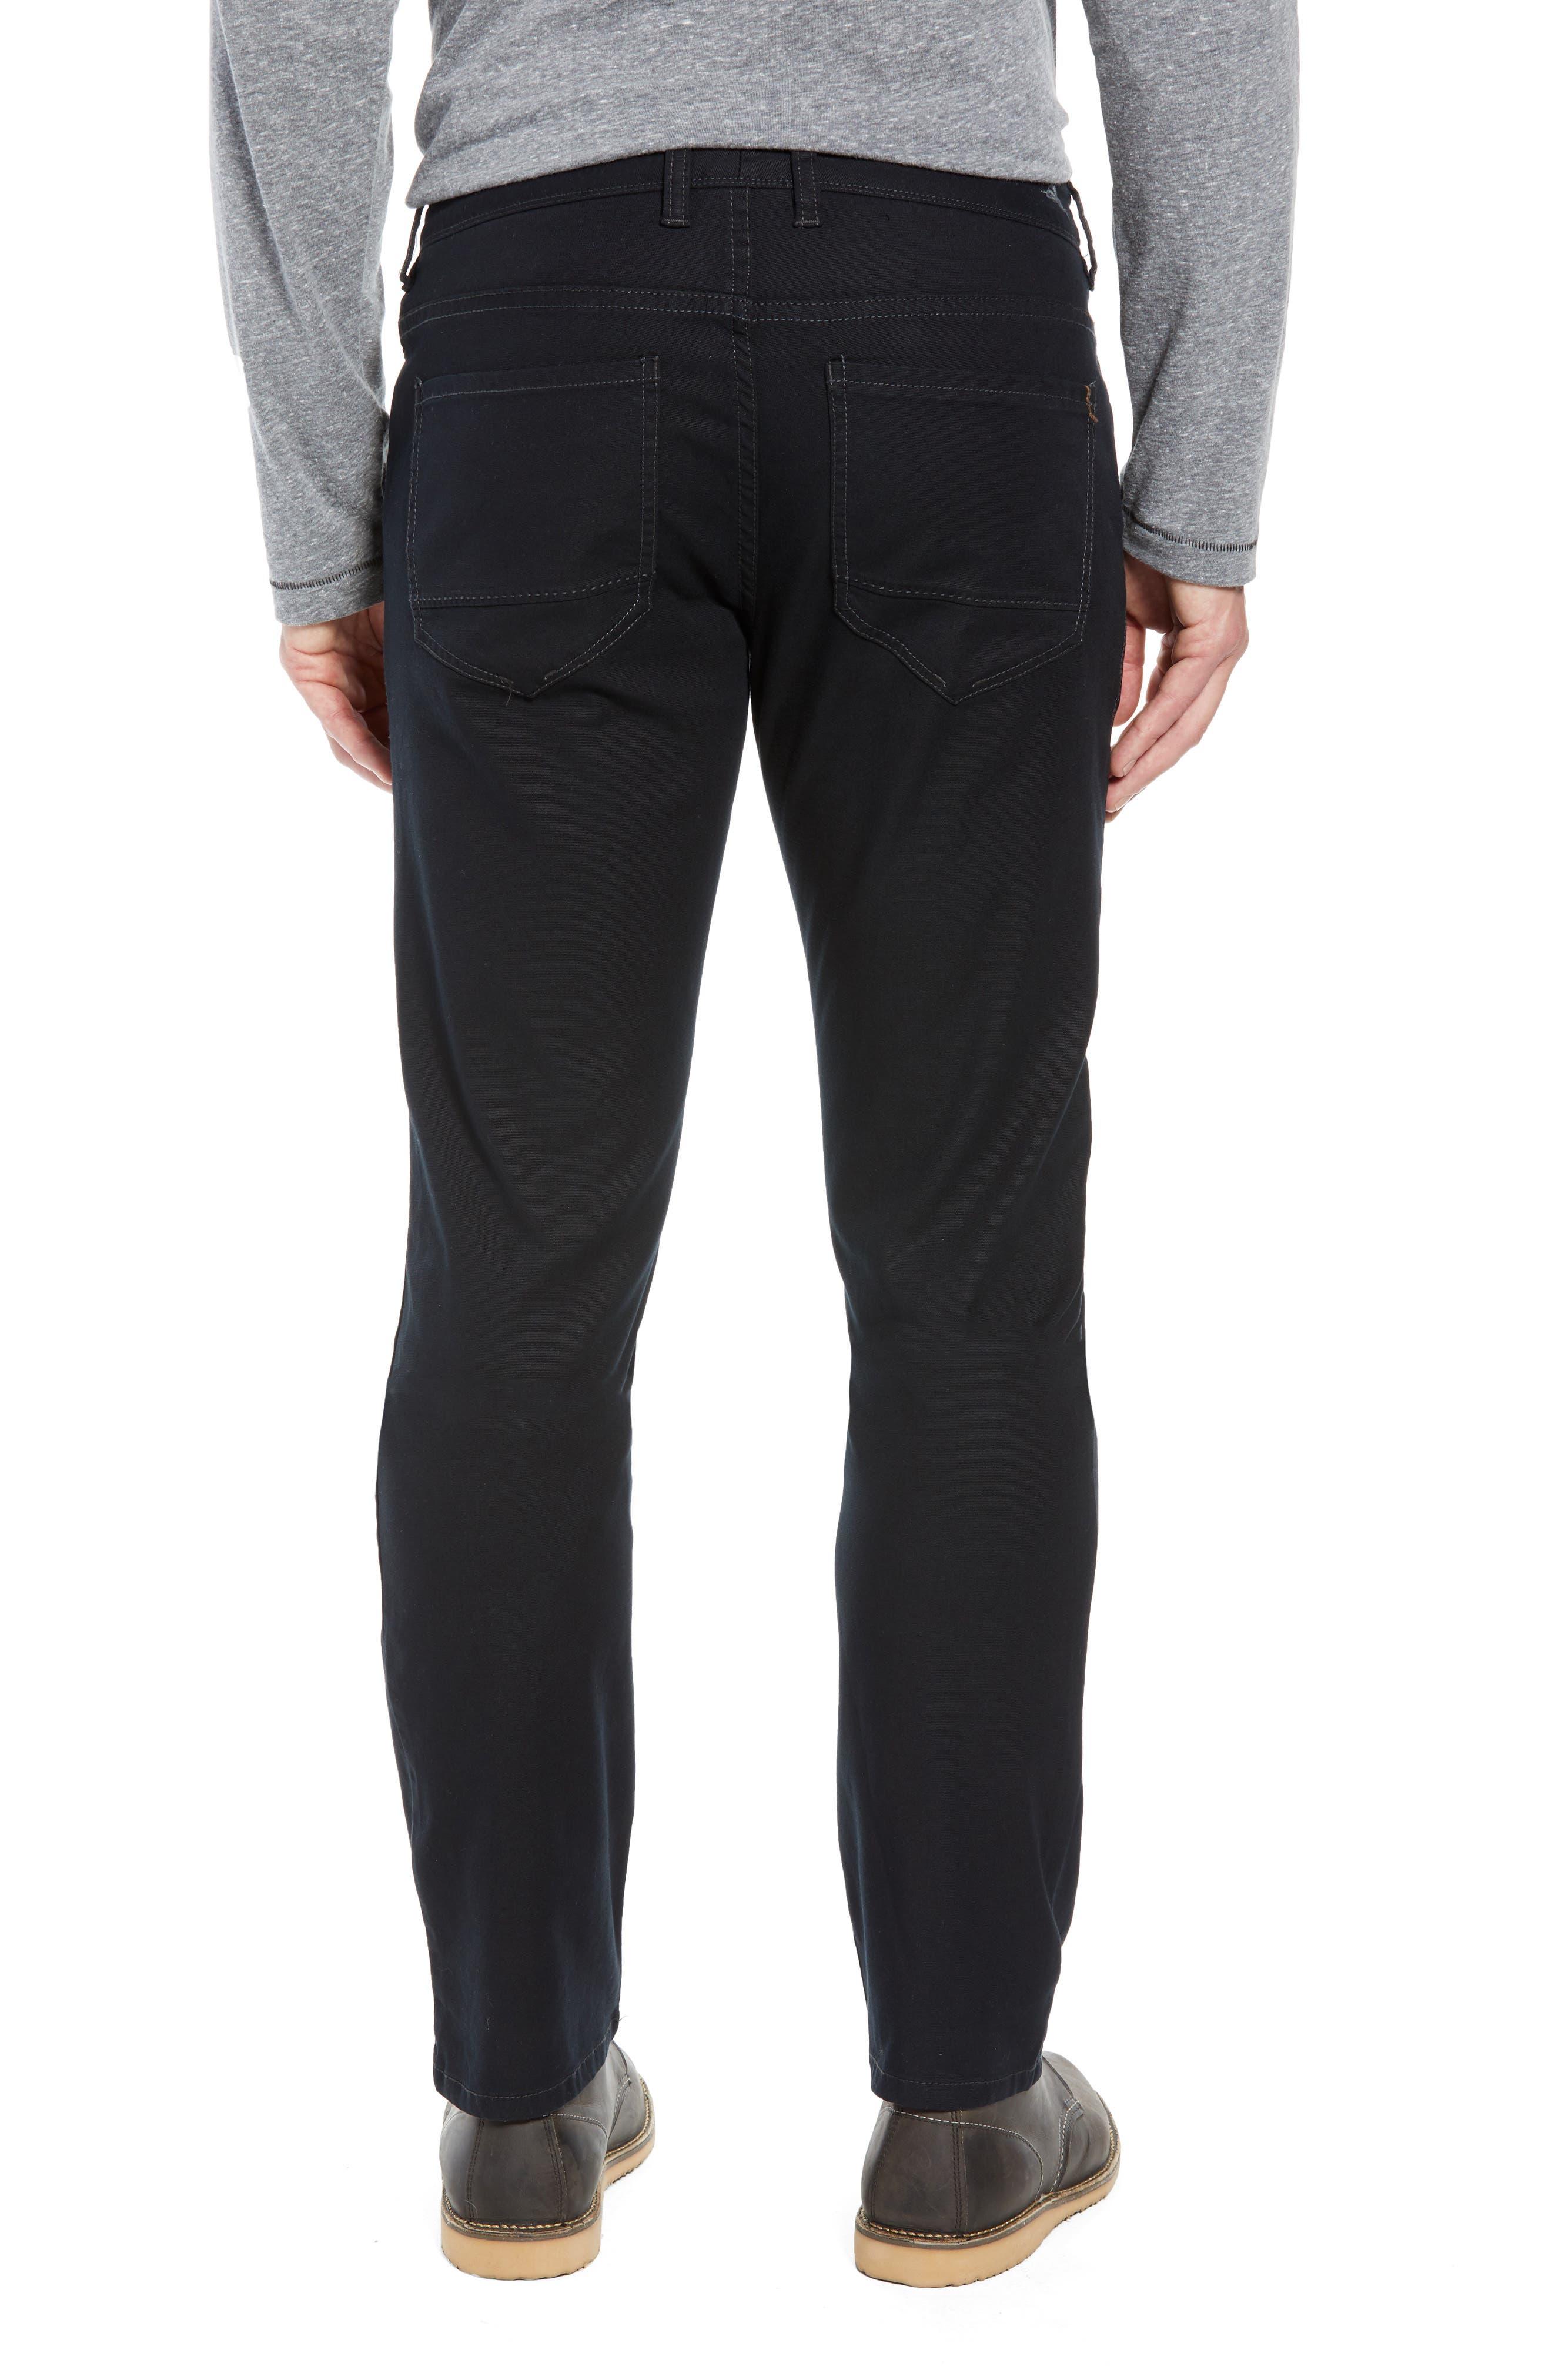 Key Isles Regular Fit Pants,                             Alternate thumbnail 2, color,                             BLACK